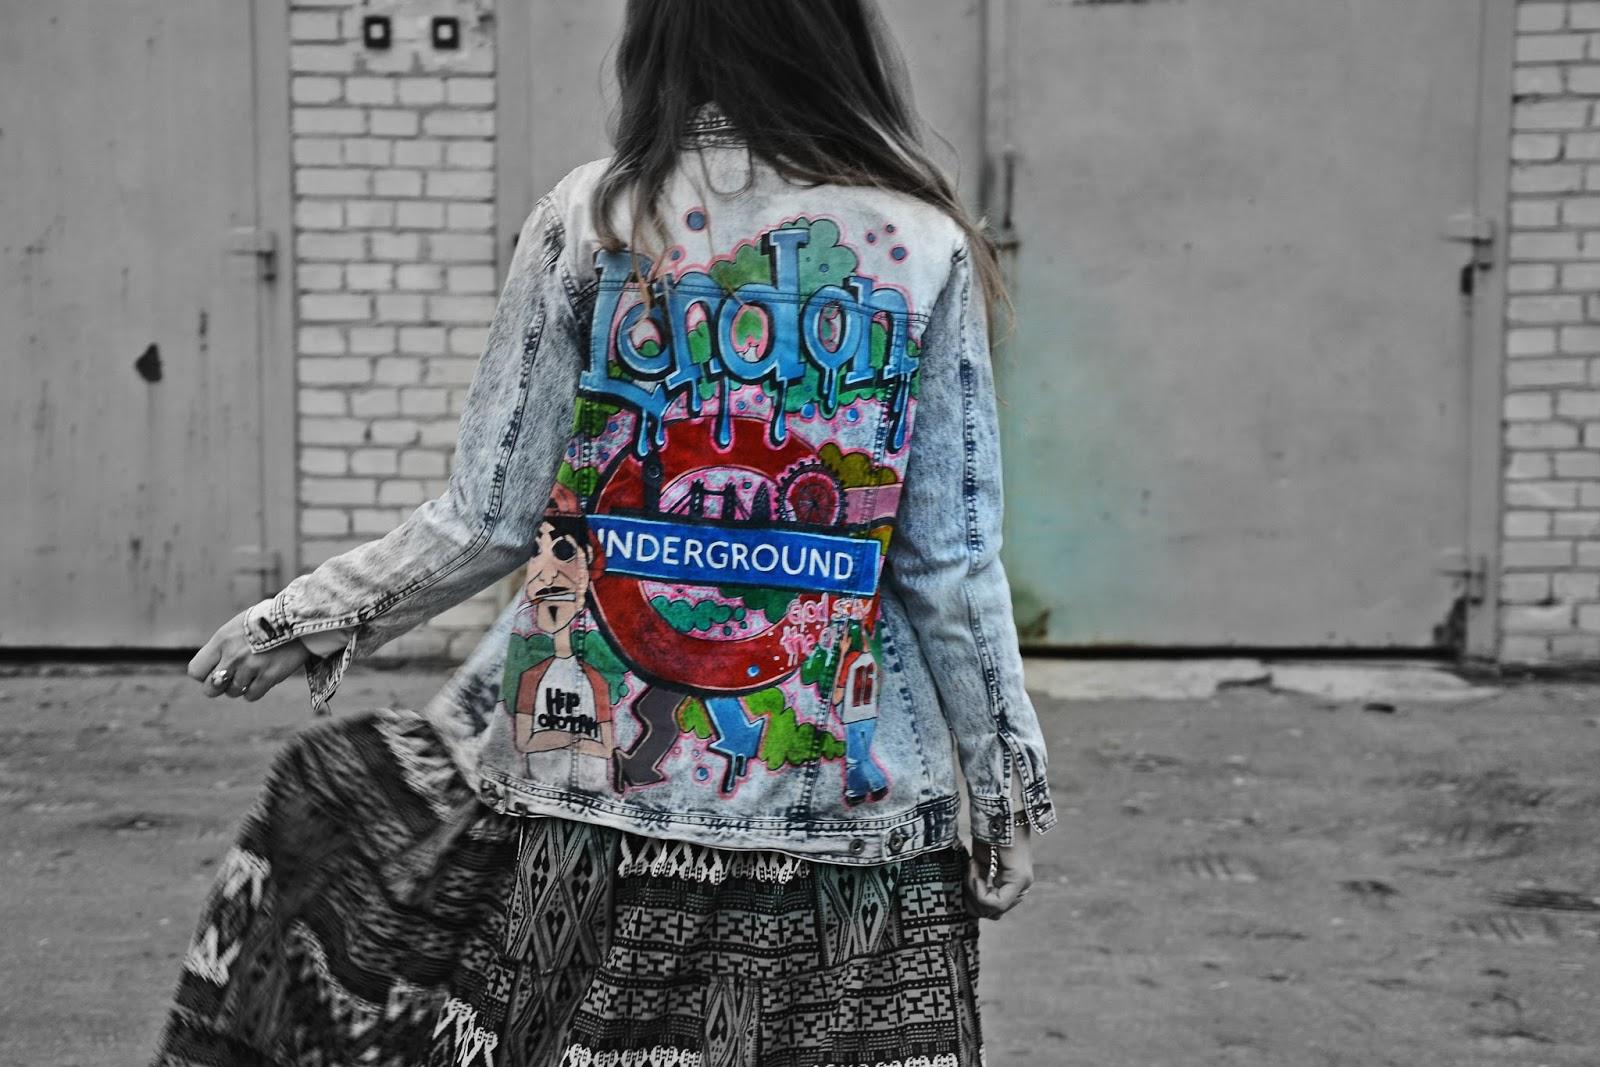 london underground jacket